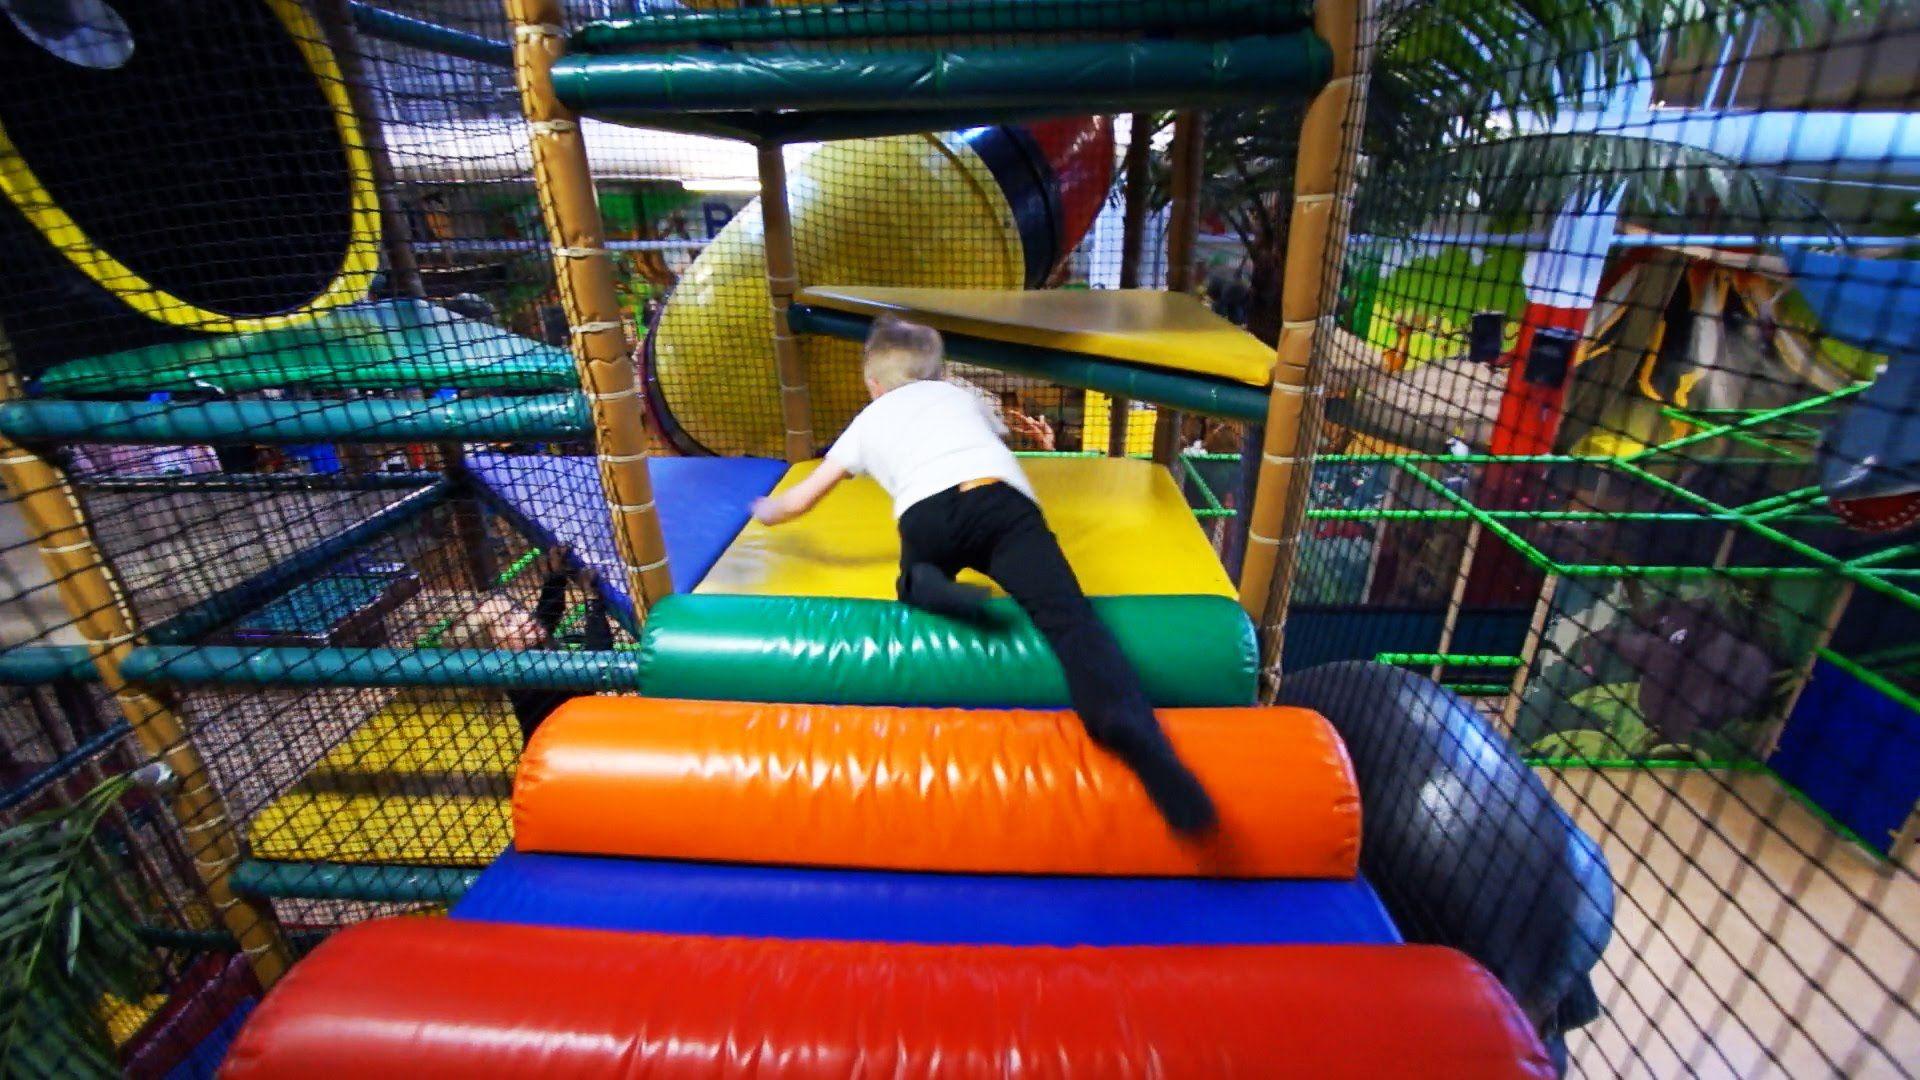 Busfabriken Indoor Playground Family Fun For Kids